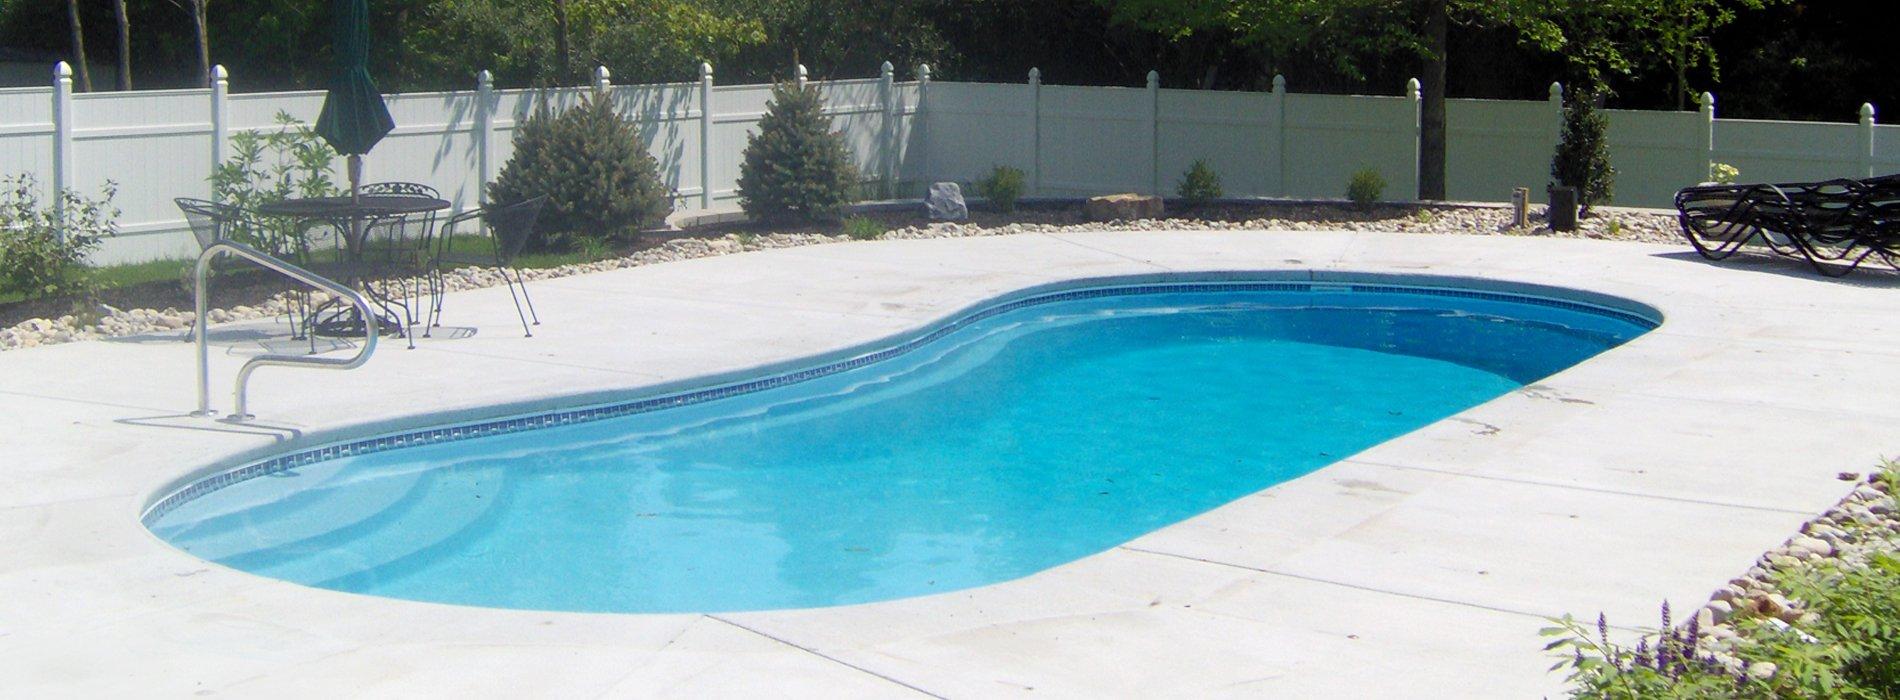 Fox Pools Of Cincinnati Inc Pool Installation Milford Oh